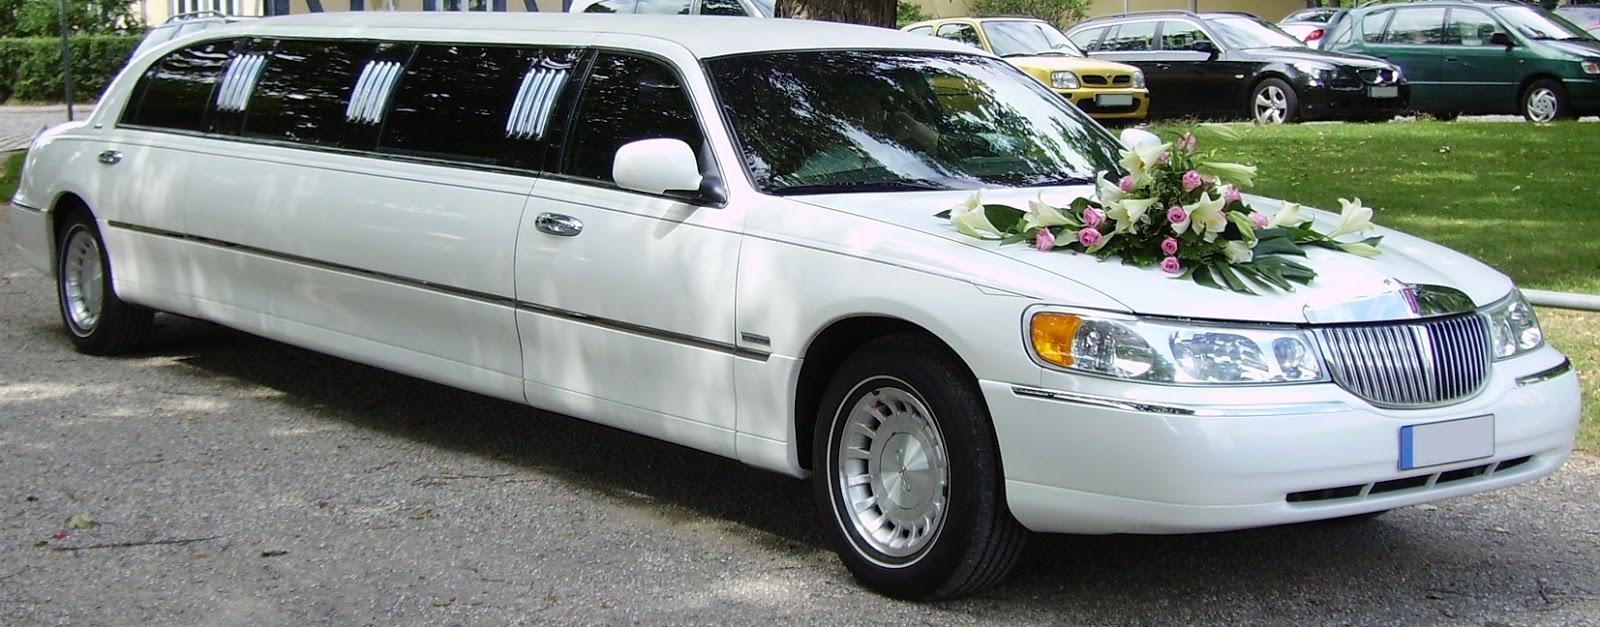 Wedding Cars For Hire In Sri Lanka Latest Models Of Hybrids